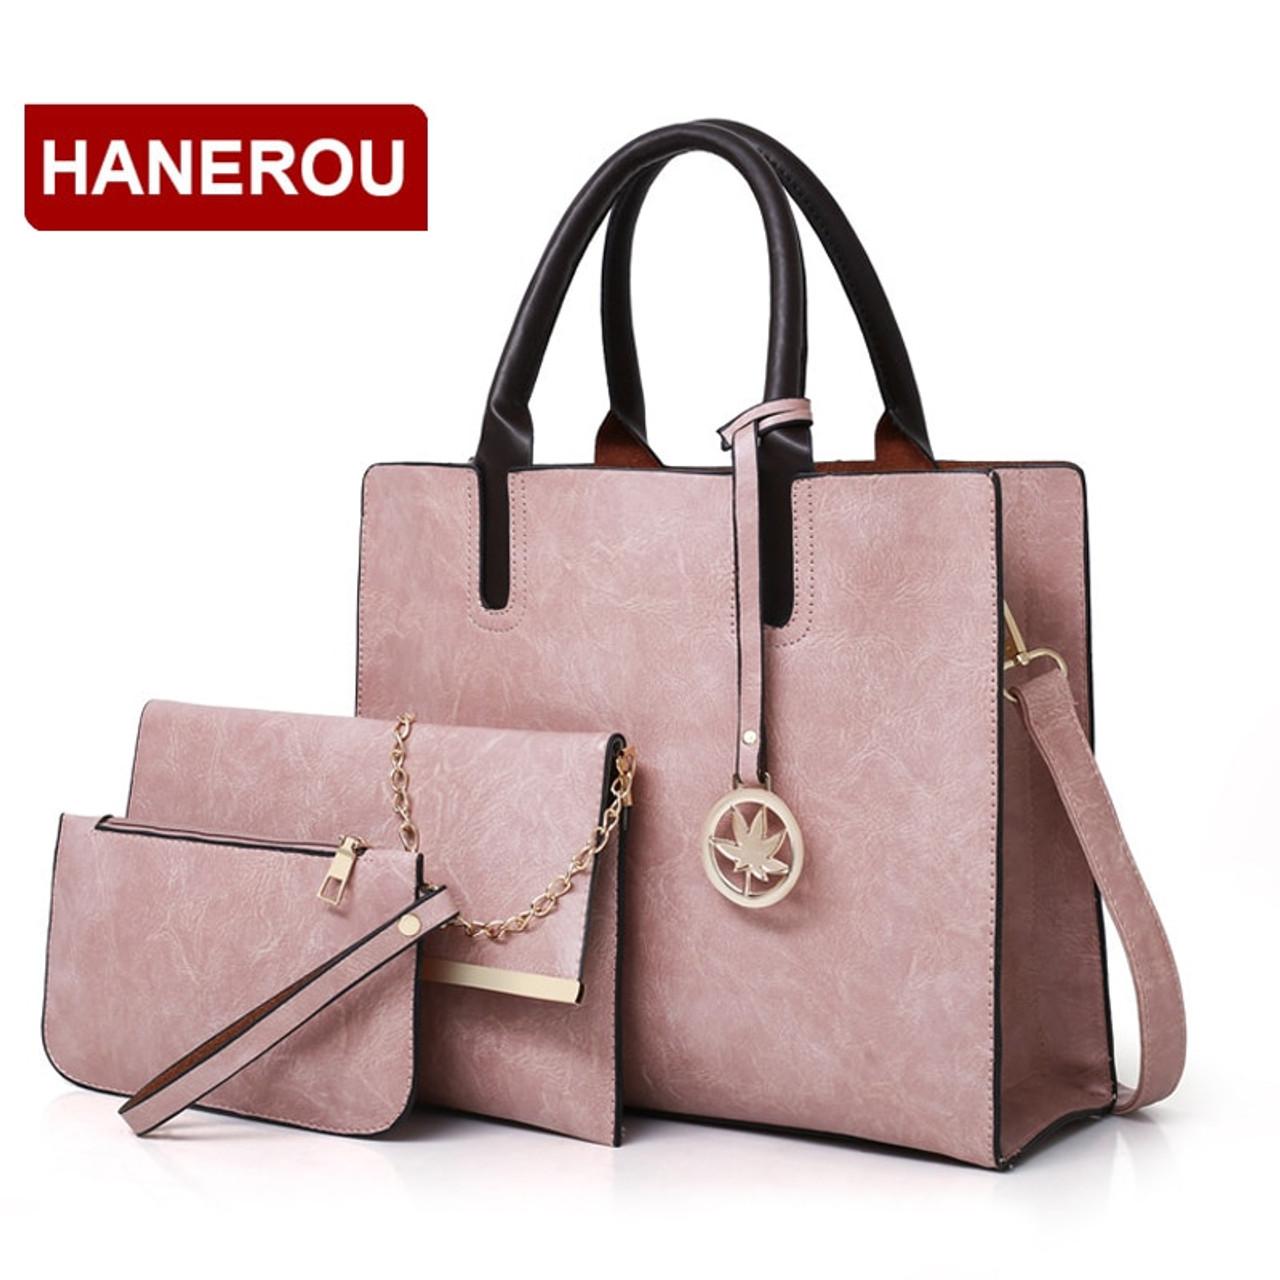 021a22a84bcc 2018 New Women Bags Set 3 Pcs Leather Handbag Women Large Tote Bags Ladies  Shoulder Bag Handbag+Messenger Bag+Purse Sac a Main